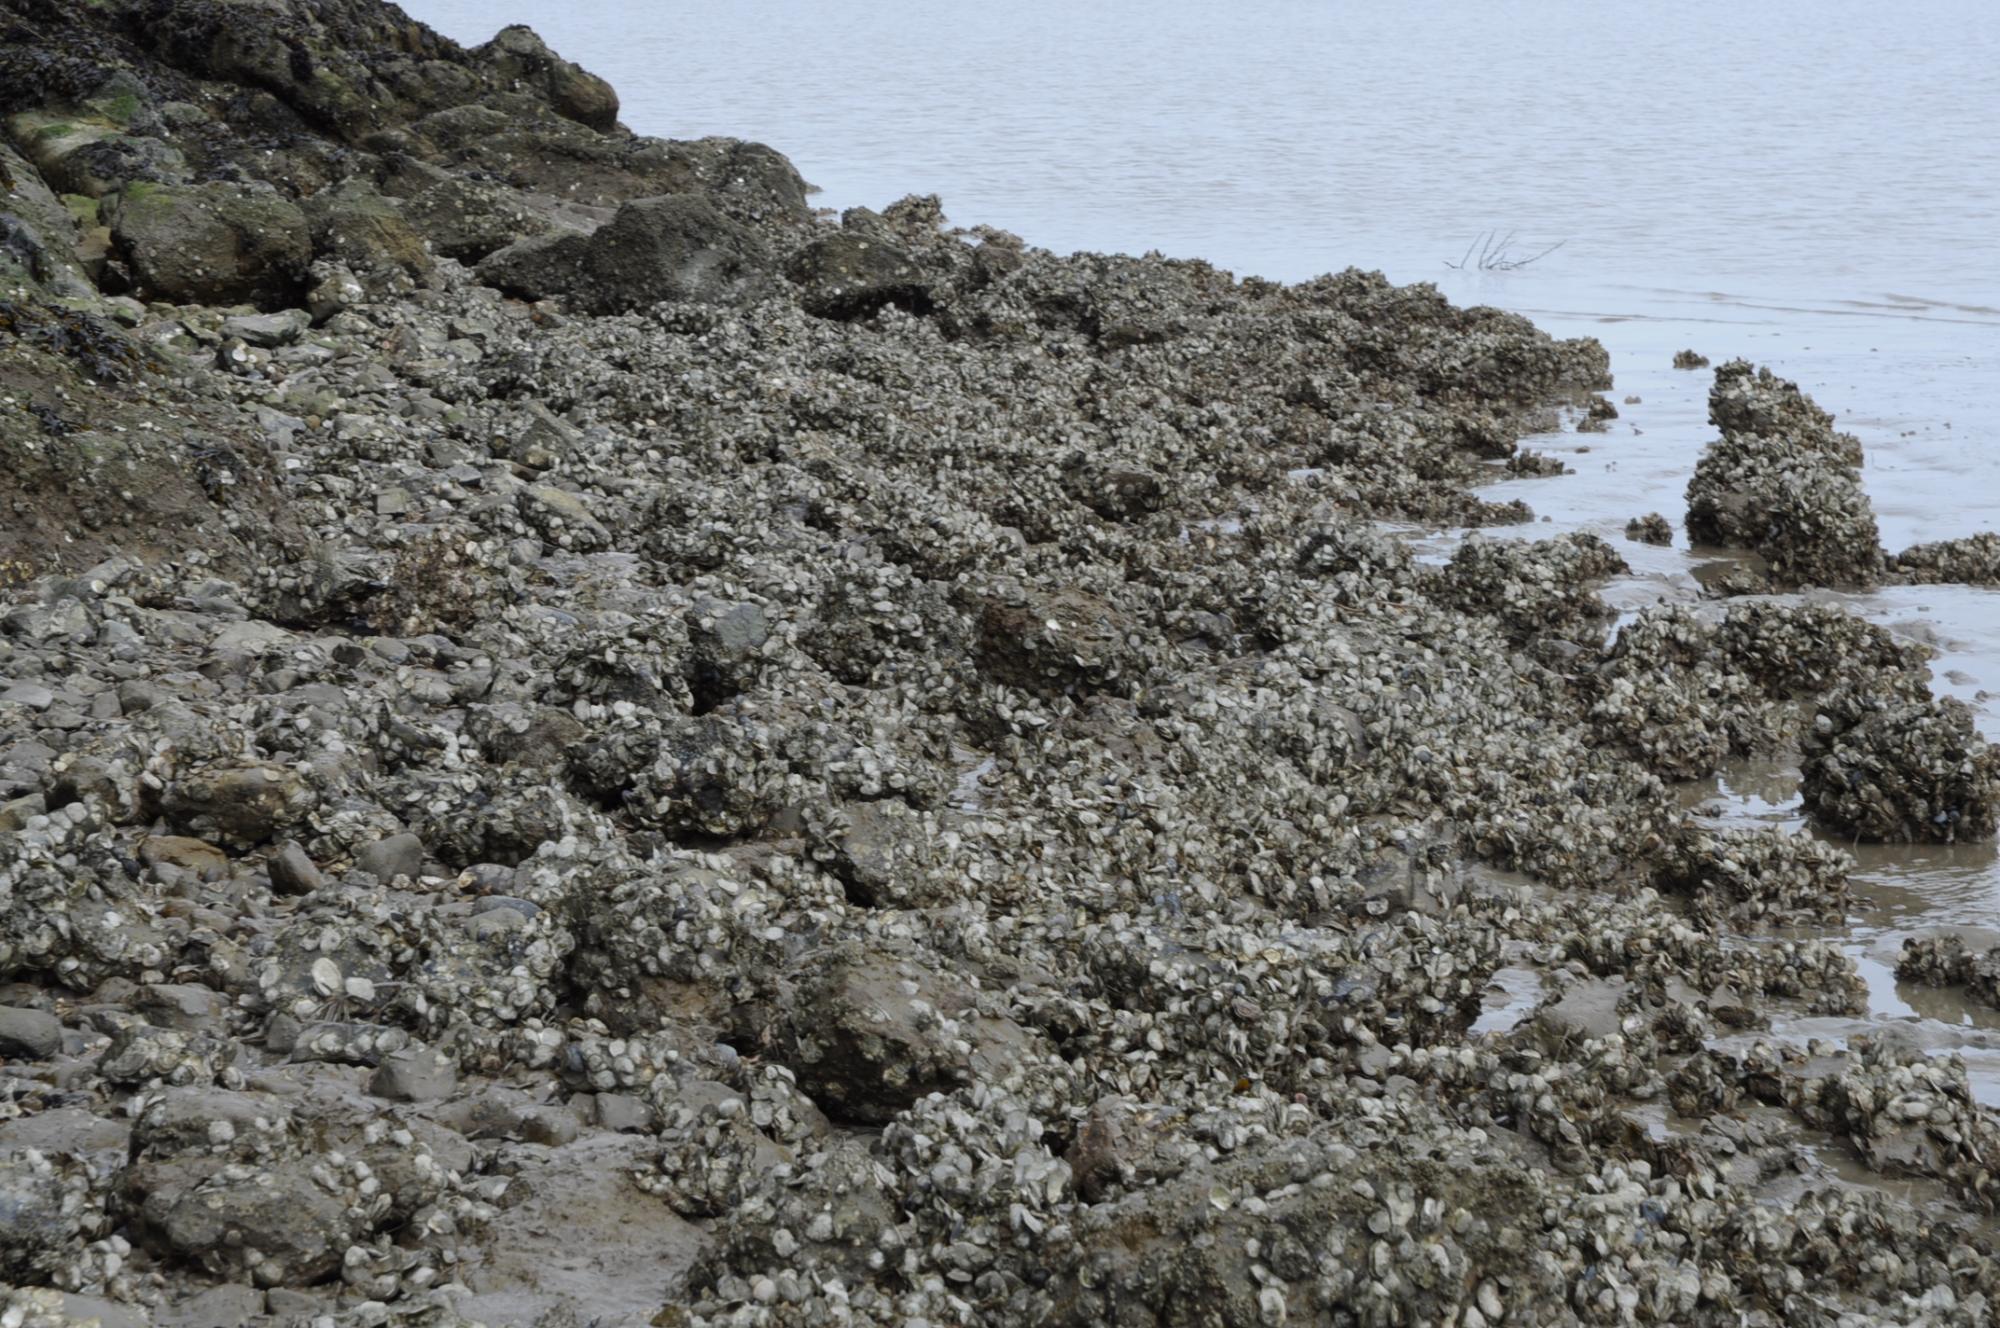 Oysters on China Camp shoreline, San Francisco Bay